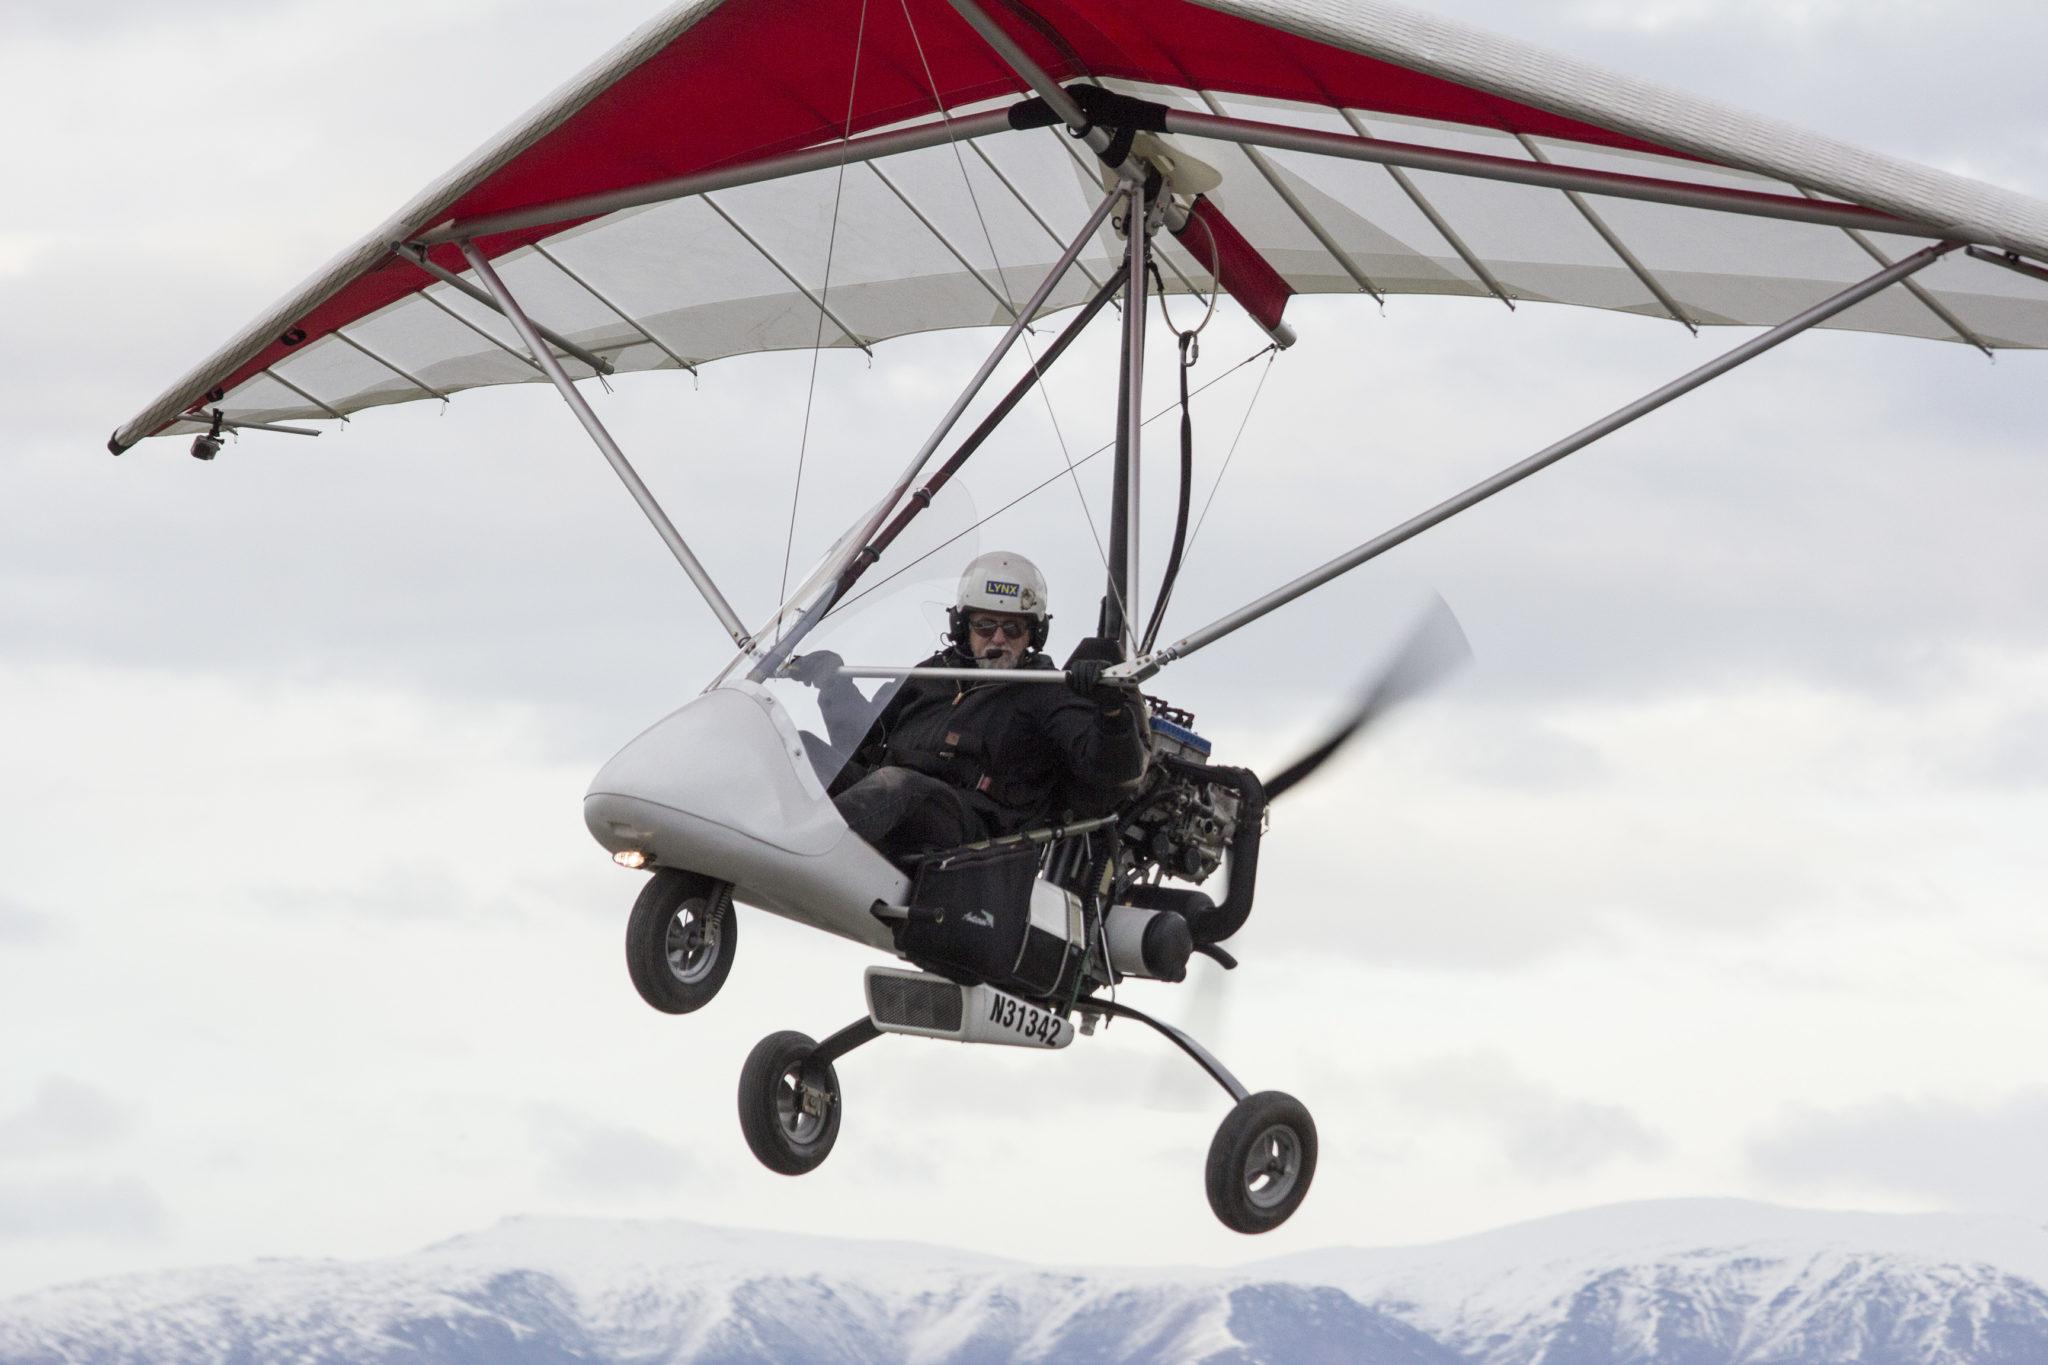 Alaska Airplane photography - Alaskafoto  Environmental portrait & Portrait photographers Alaska